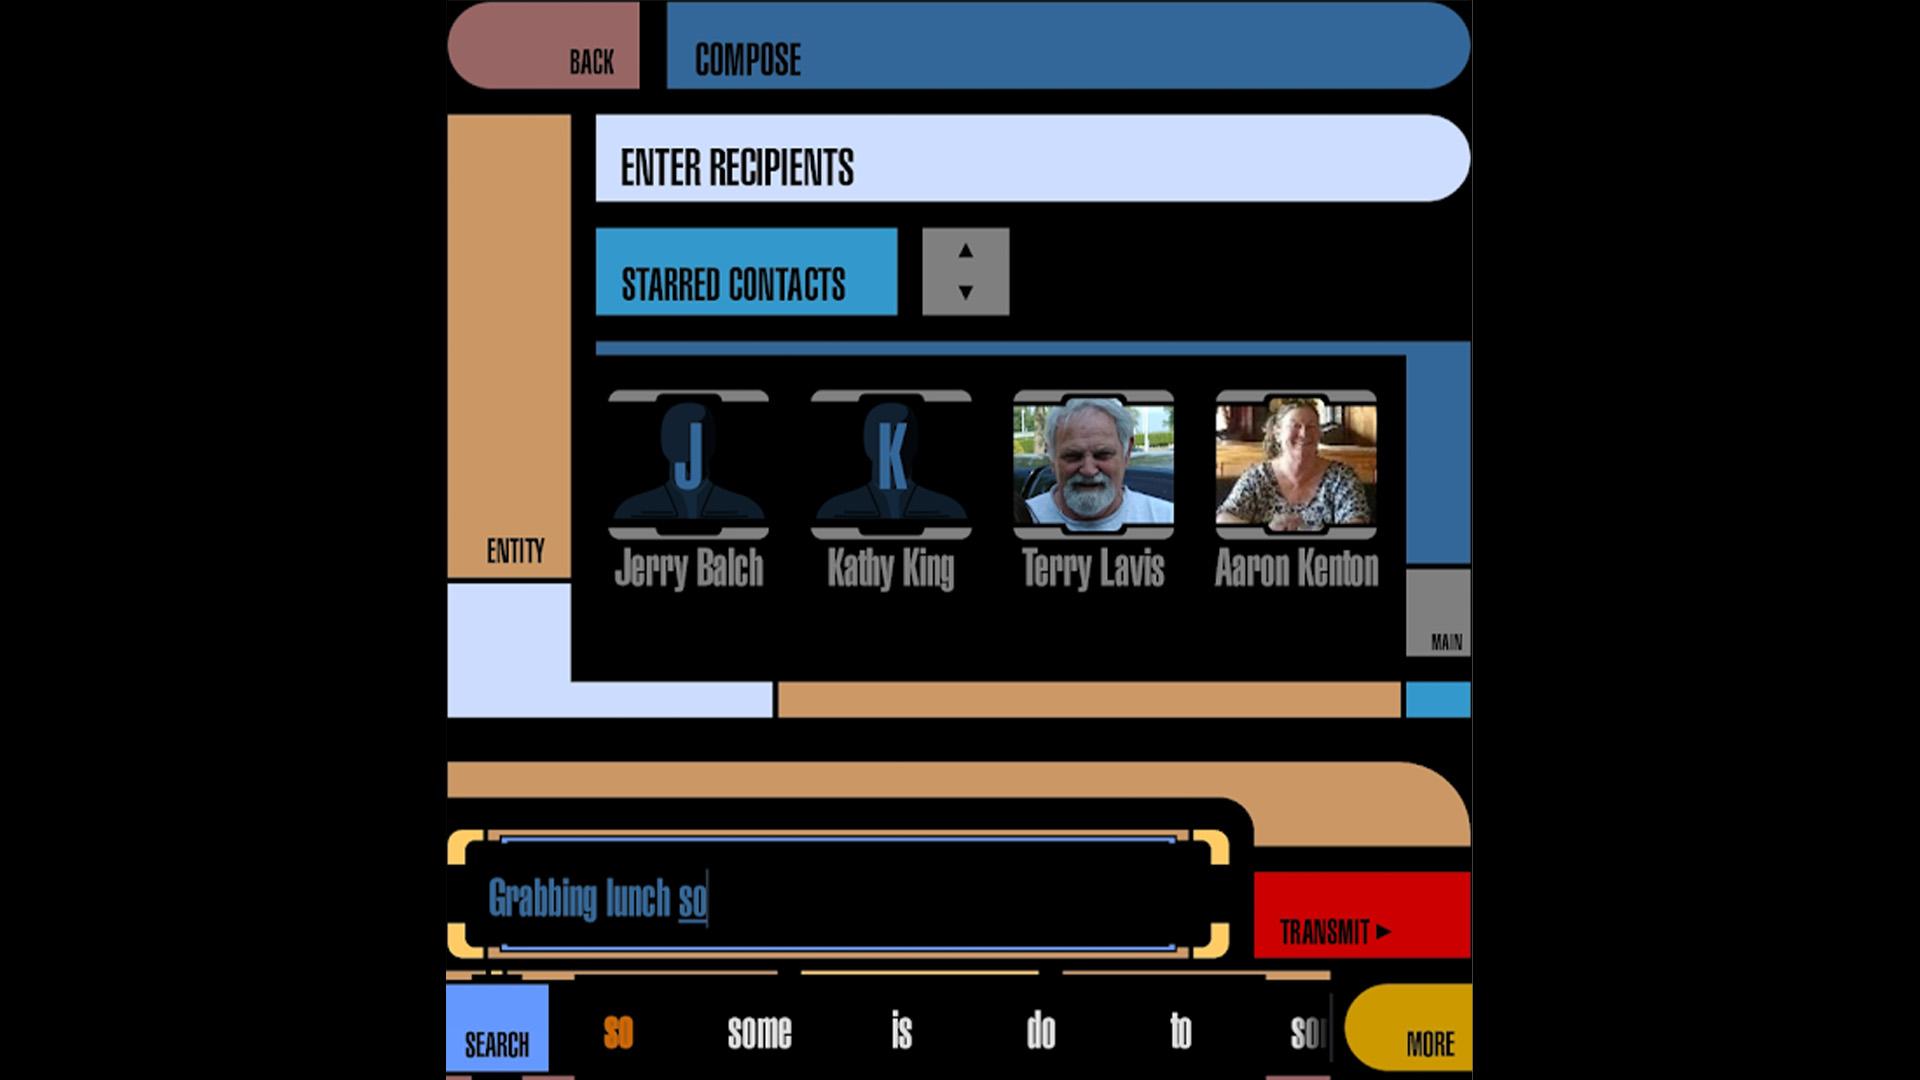 Trek TI Keyboard best star trek apps for Android